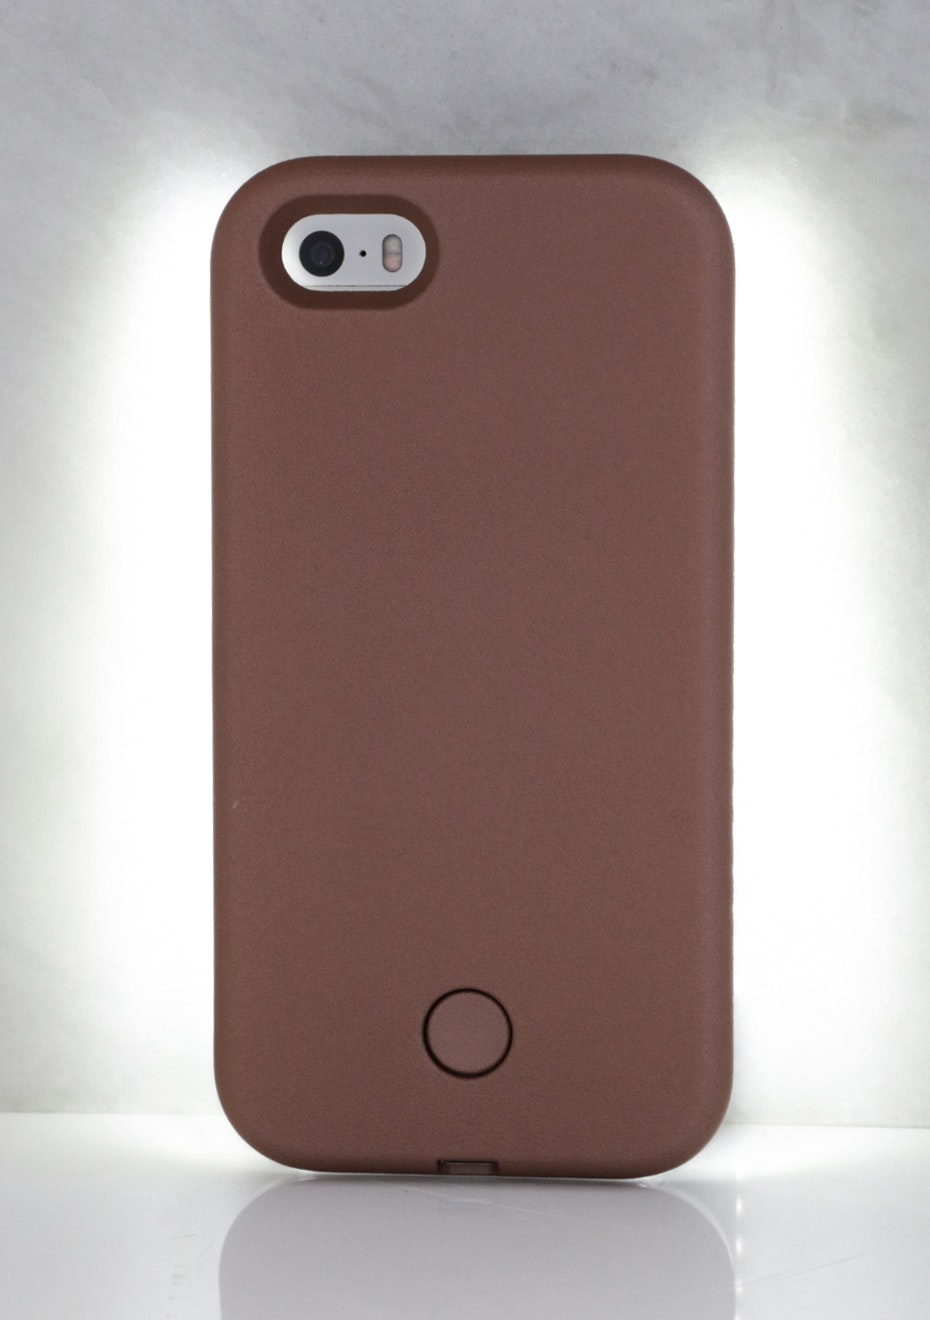 IPHONE 5/5S LIGHT CASE - Metallic Nude